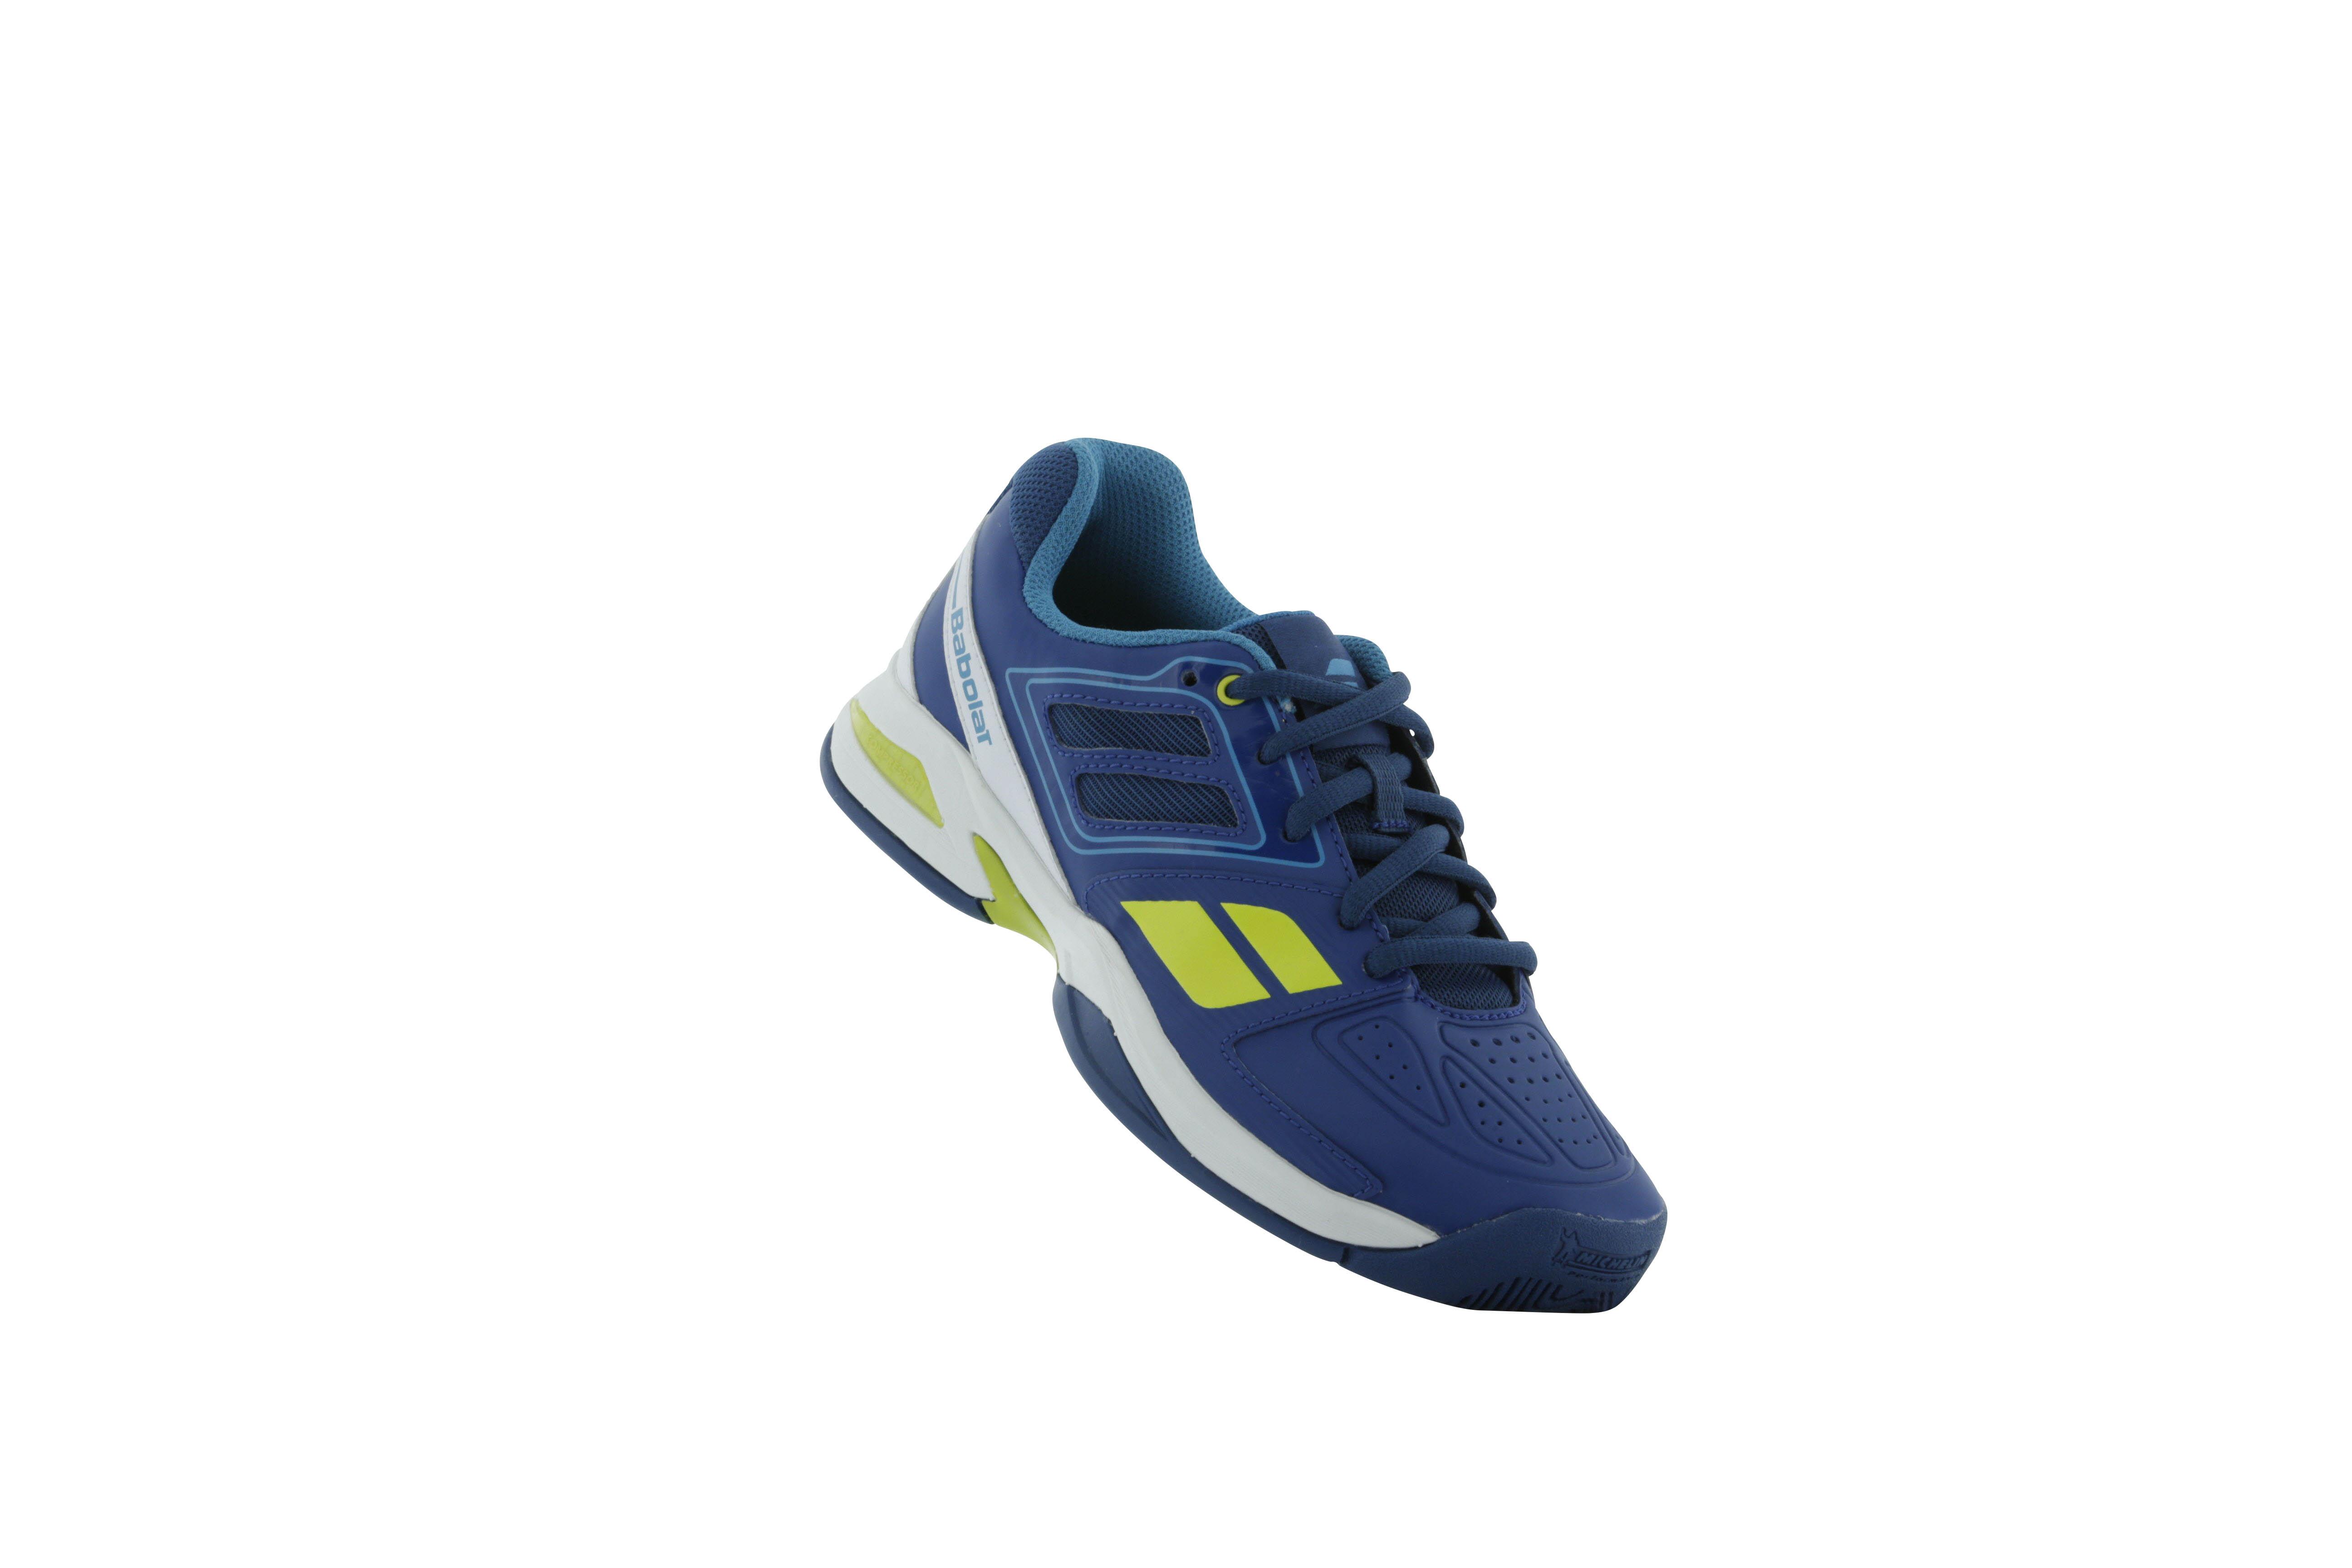 553d5cee56477 Babolat Pro Pulse Team BPM JR Dark Blue Tennis Shoes